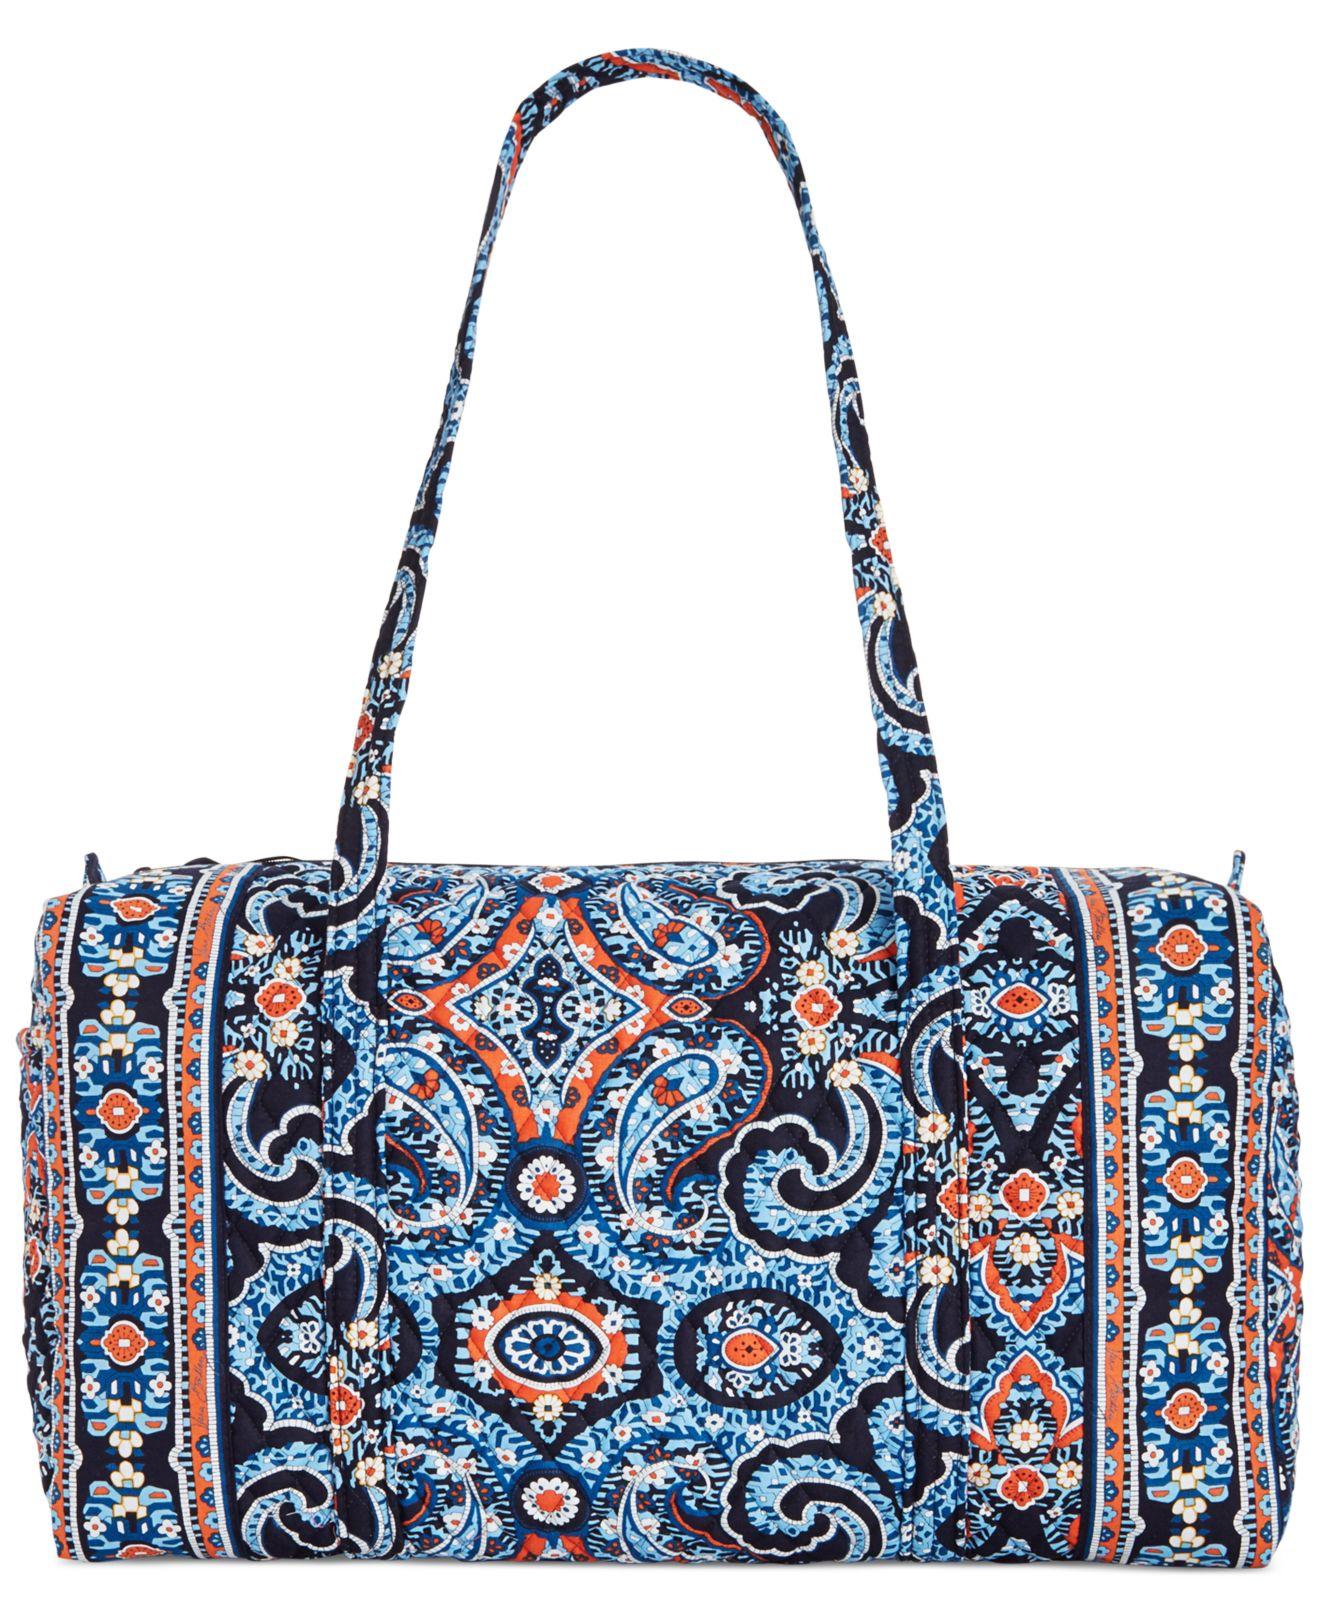 Gym Bag Vera Bradley: Vera Bradley Large Duffle Bag